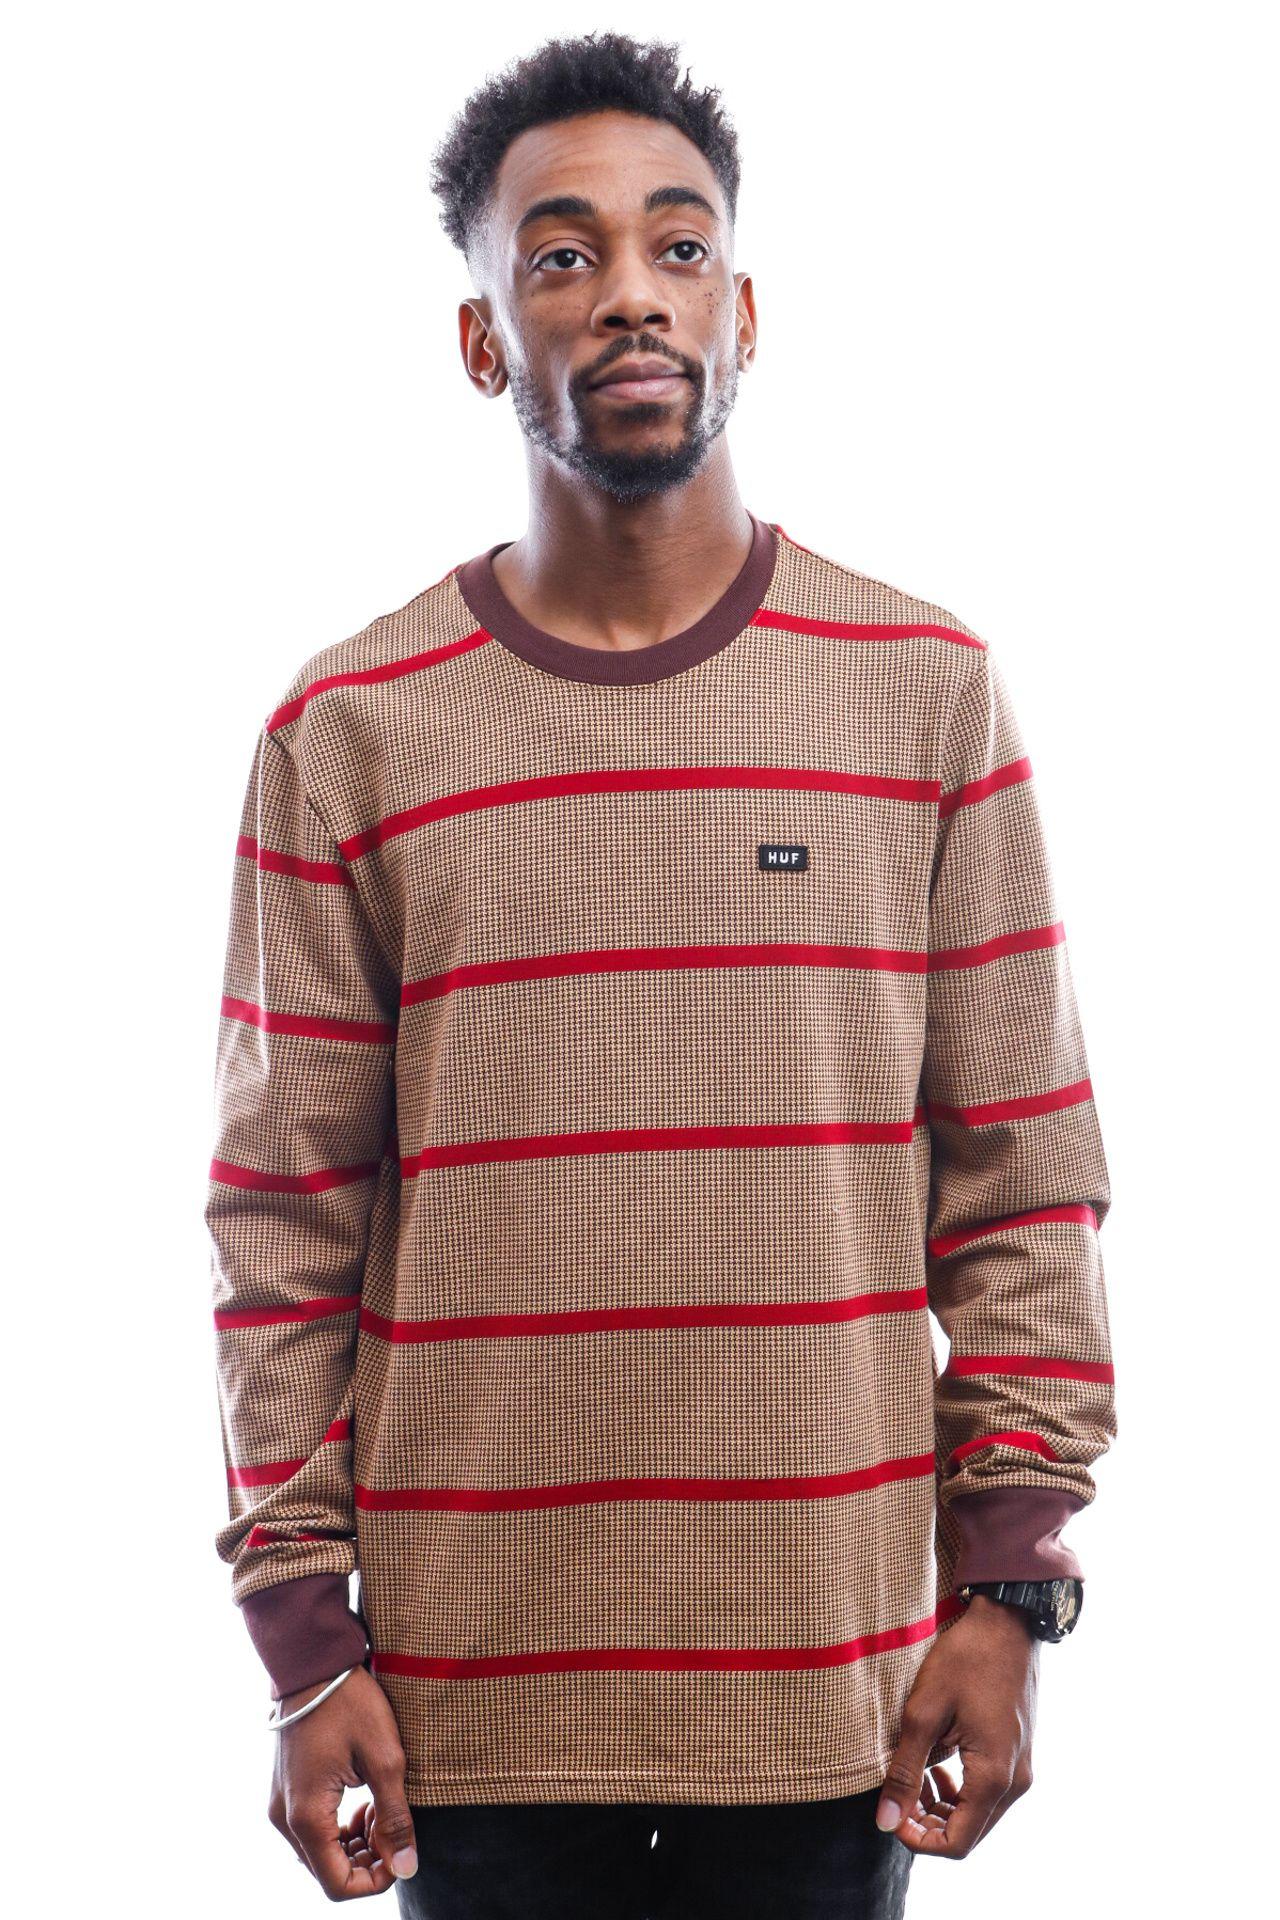 Afbeelding van HUF Long Sleeve Houndstooth Stripe L/S Knit Deep Mahogany Kn00207-Dpmhg